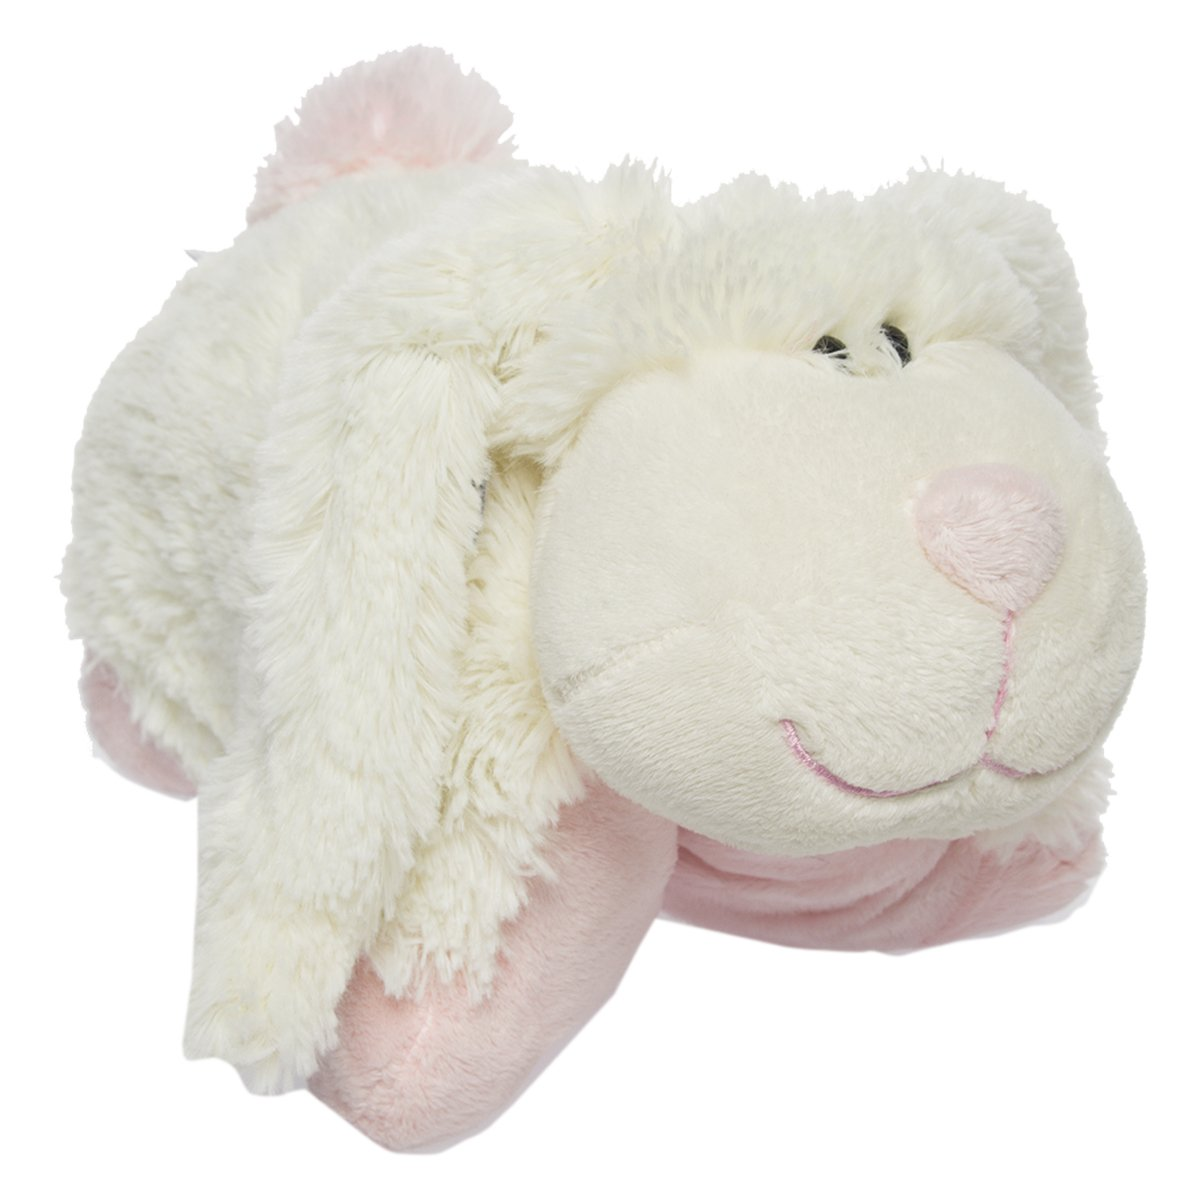 Amazon Com Pillow Pets Pee Wee 11 Super Soft Stuffed Animal Pillow